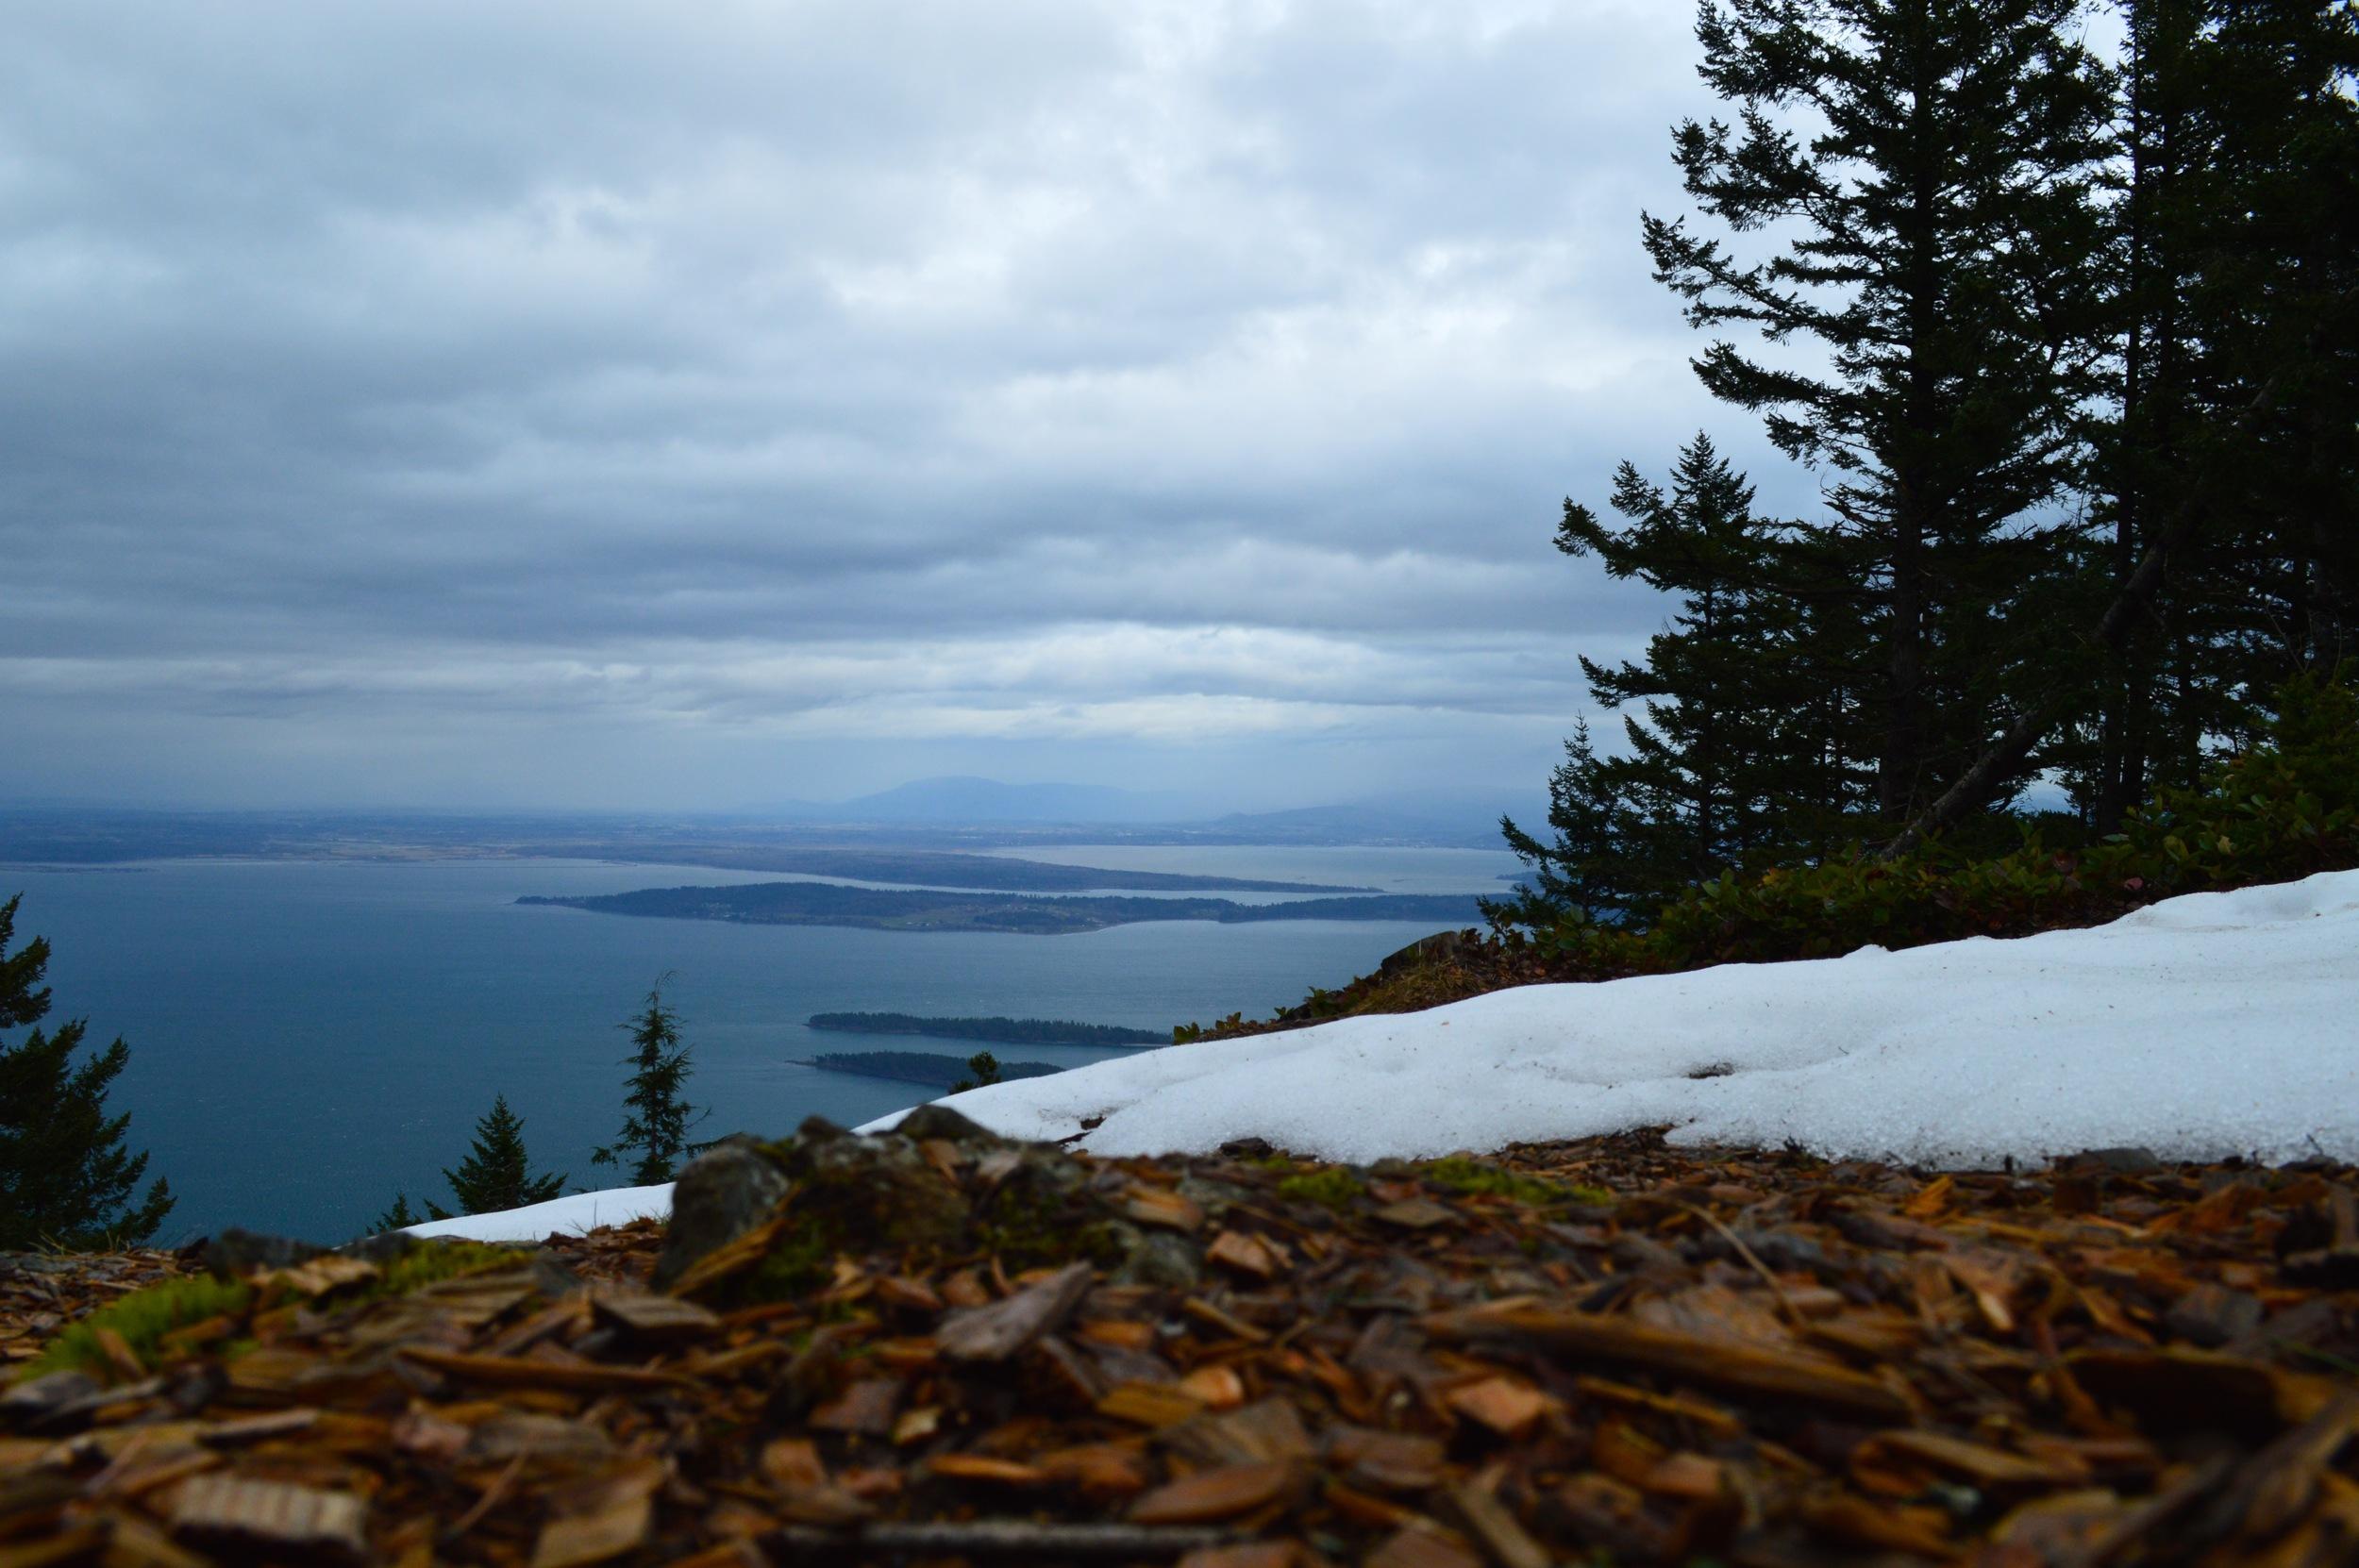 Snow remains atop Mt. Constitution